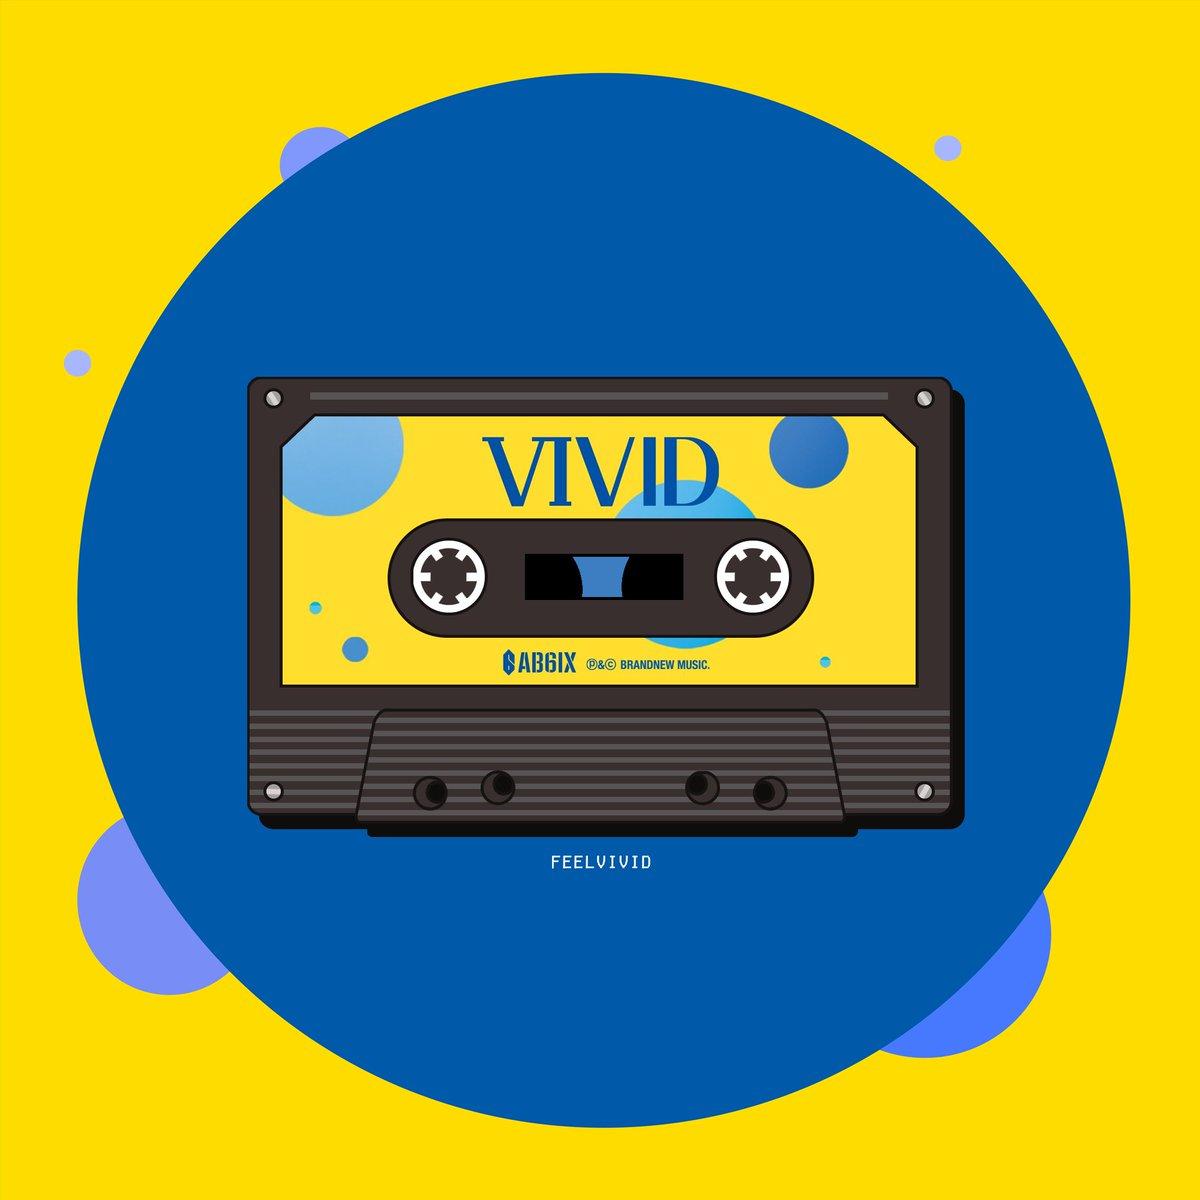 ab6ix's 2nd ep 'vivid' but as a cassette tape #AB6IX #VIVID<br>http://pic.twitter.com/TnRDplap2C